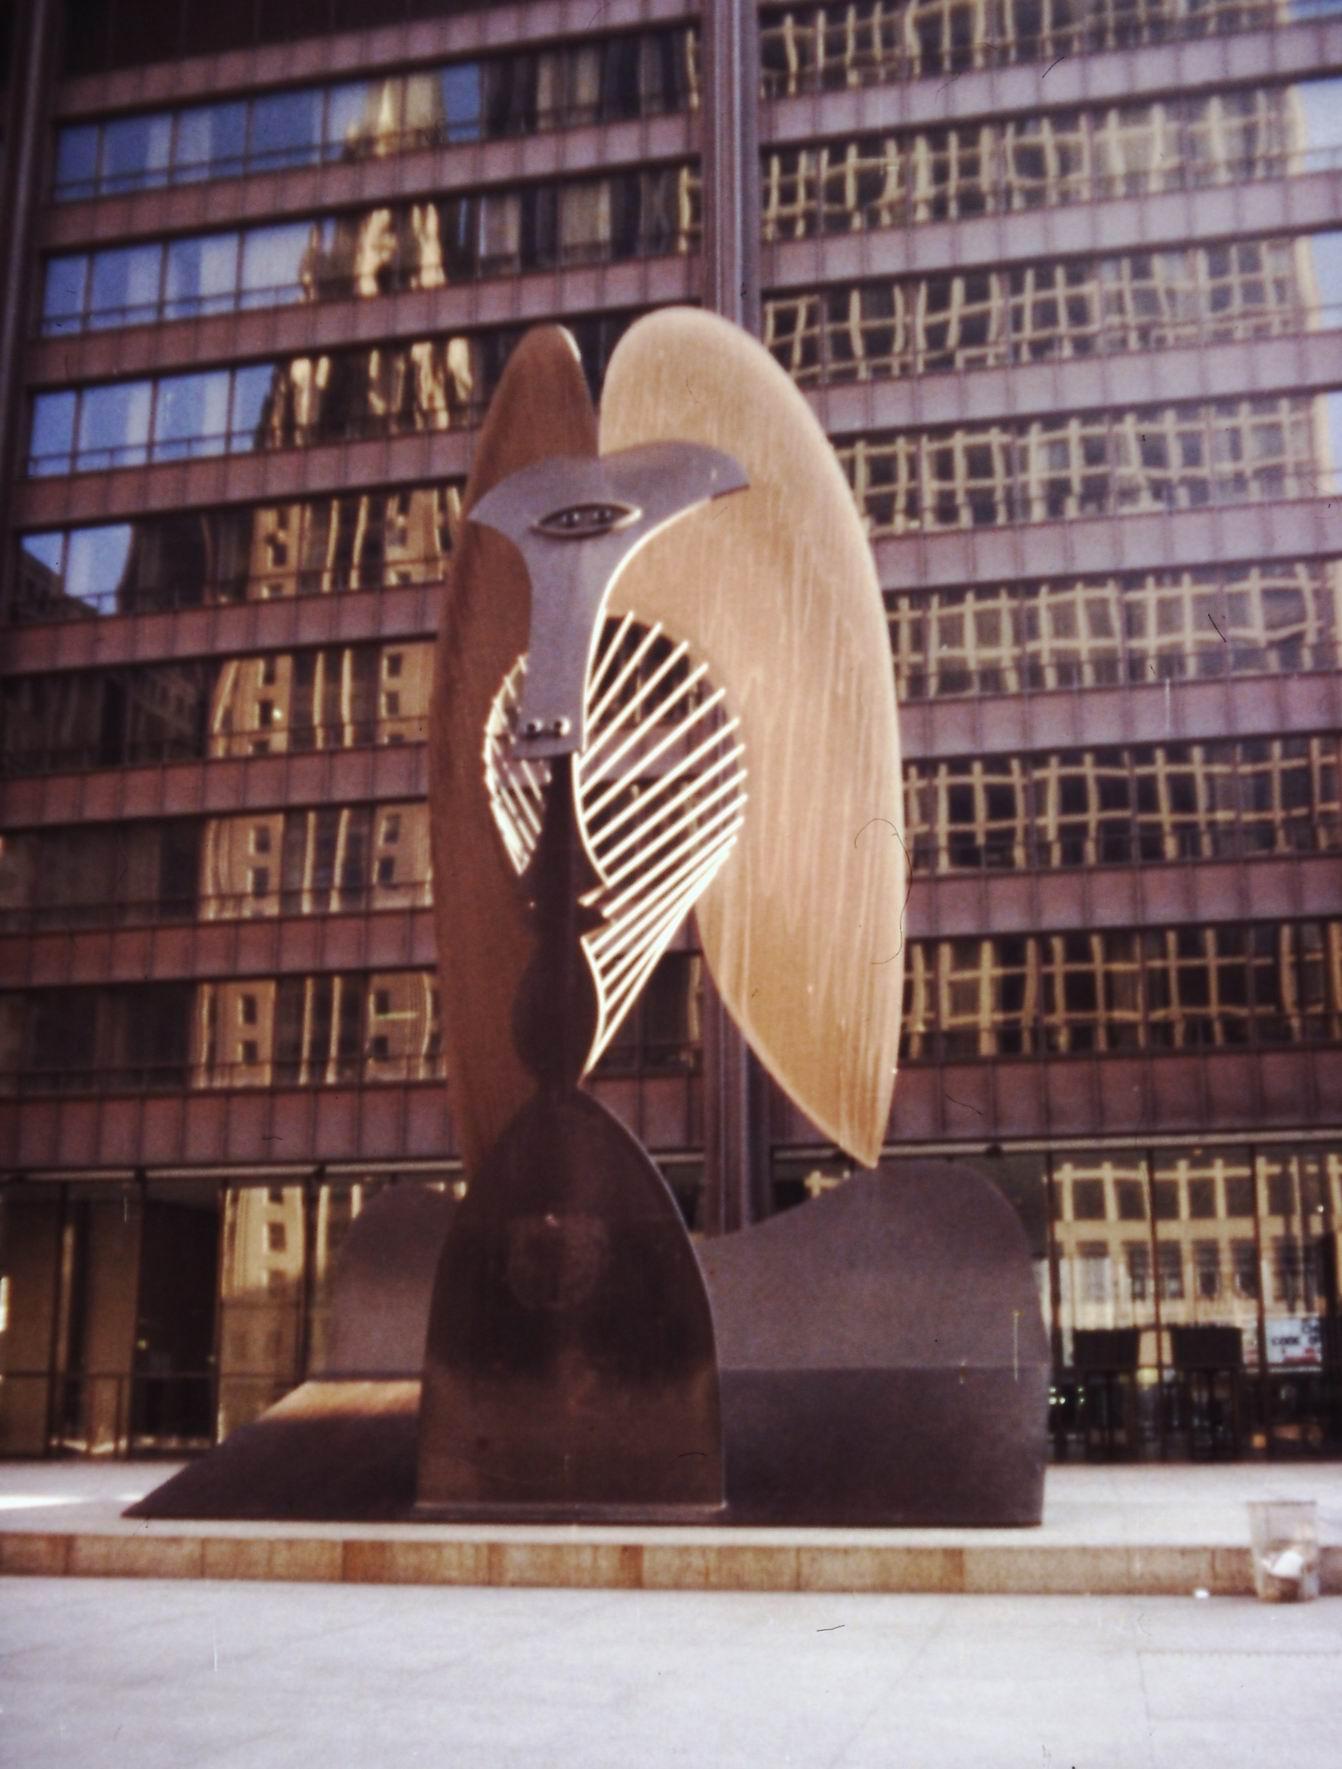 Picassova plastika (1967) před Civic Center v Chicagu